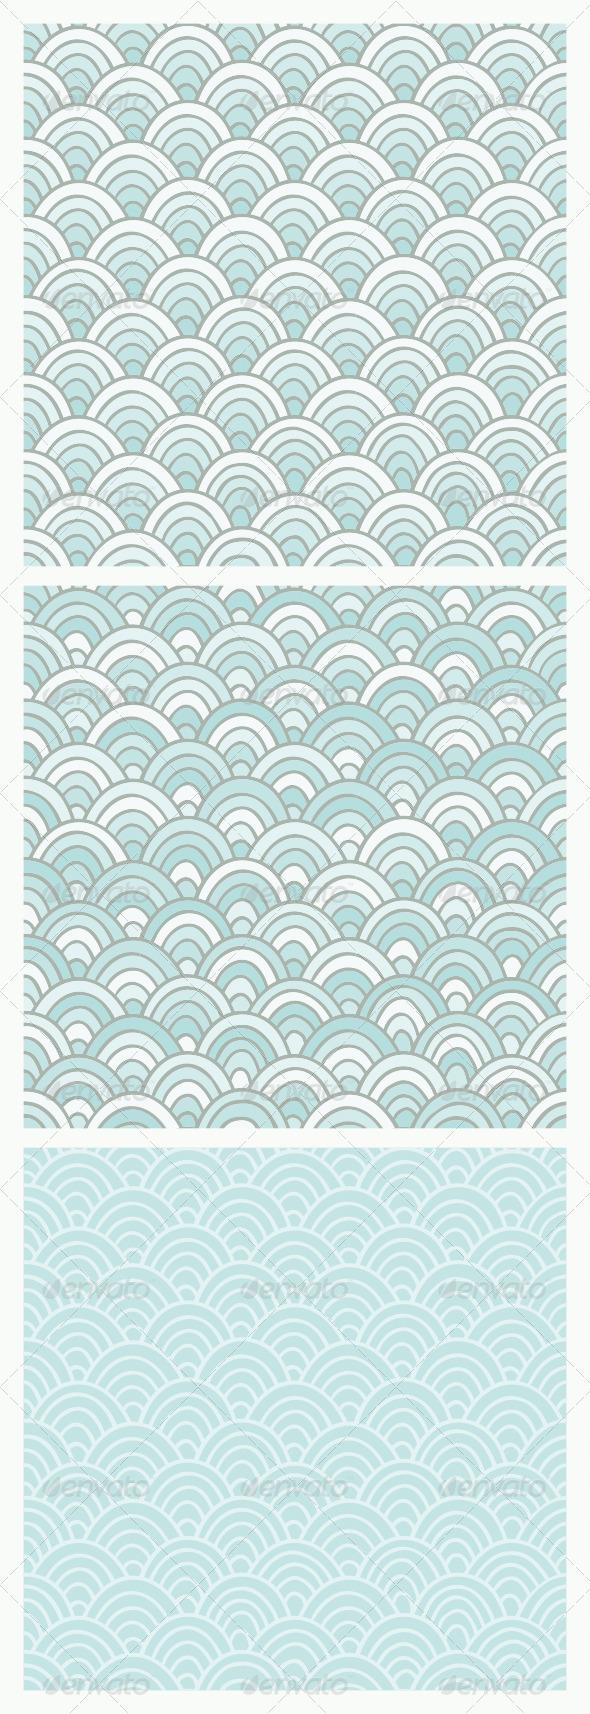 GraphicRiver Blue Doodle Pattern 8066044